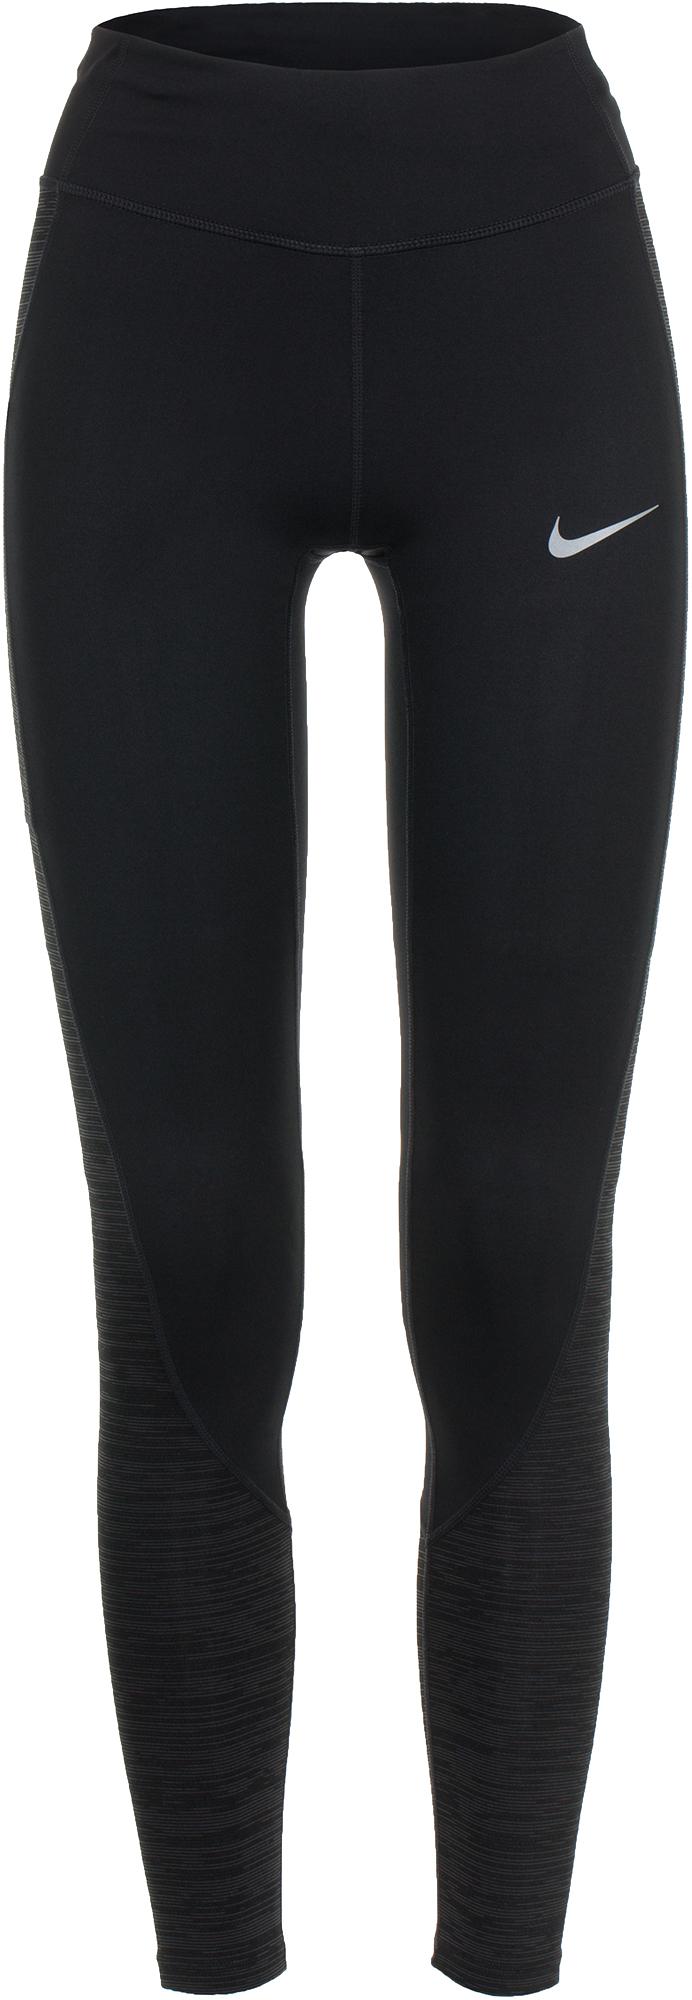 Nike Легинсы женские Nike Racer, размер 42-44 nike легинсы женские nike sculpt hyper